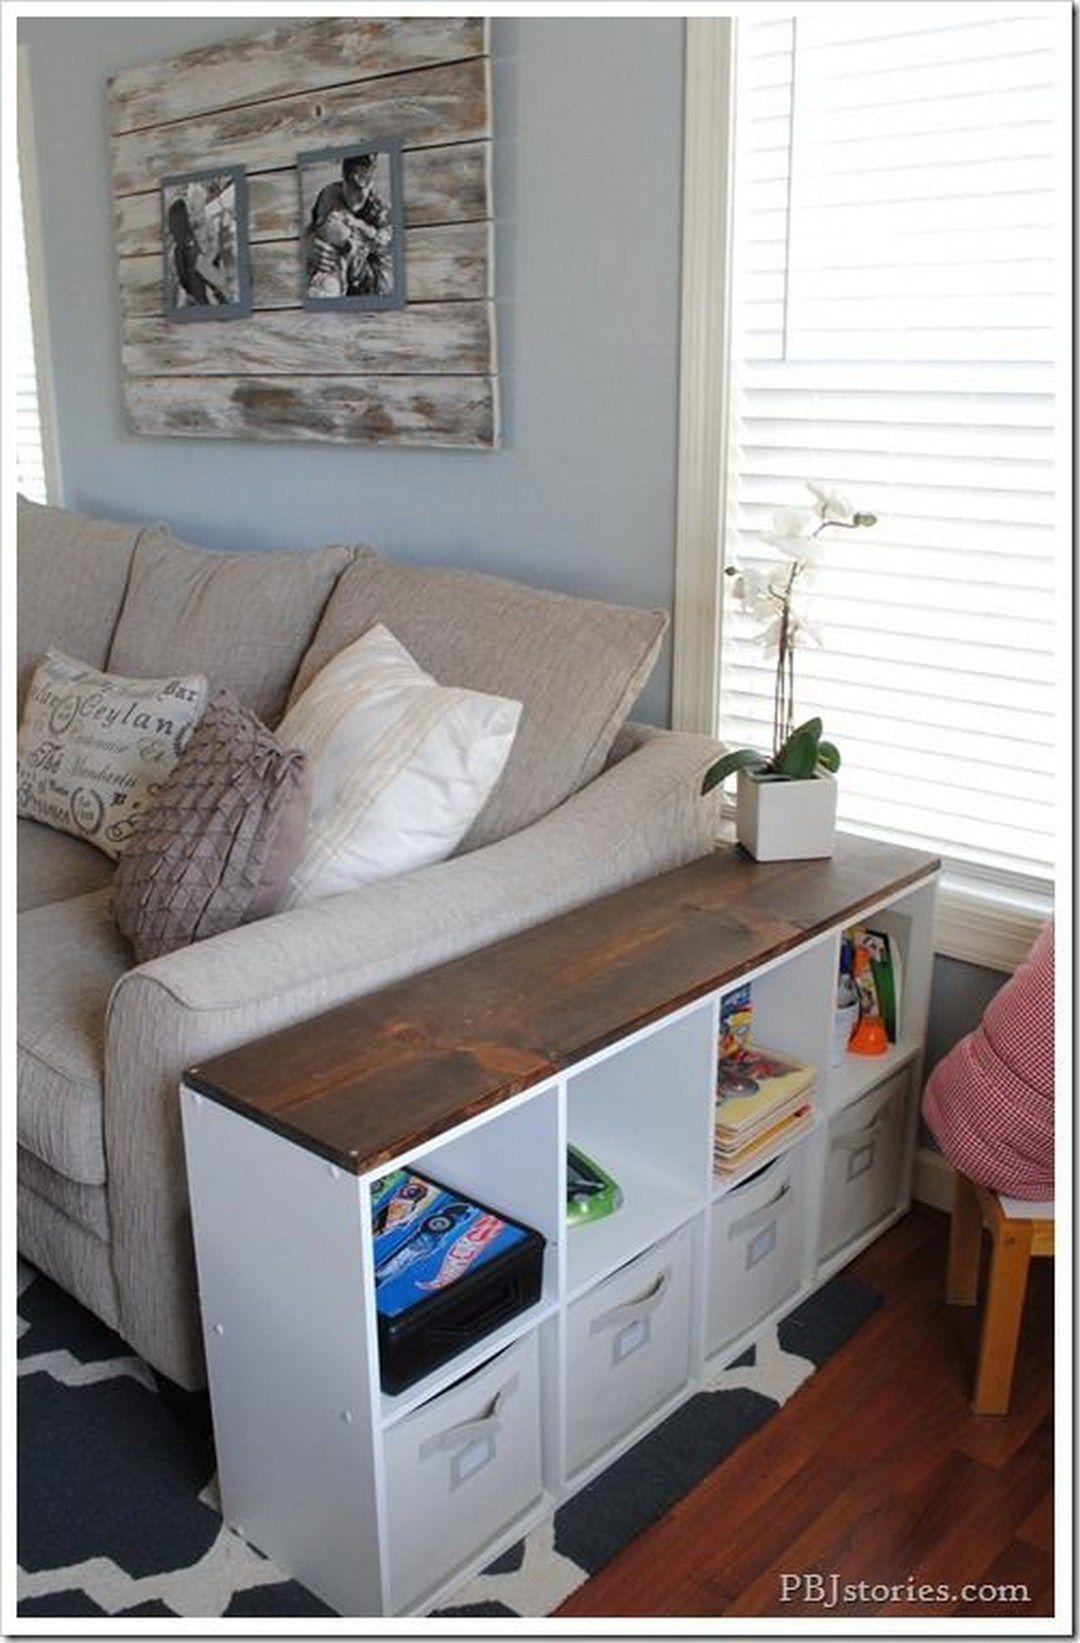 99 Genius Apartement Storage Ideas For Small Spaces 78